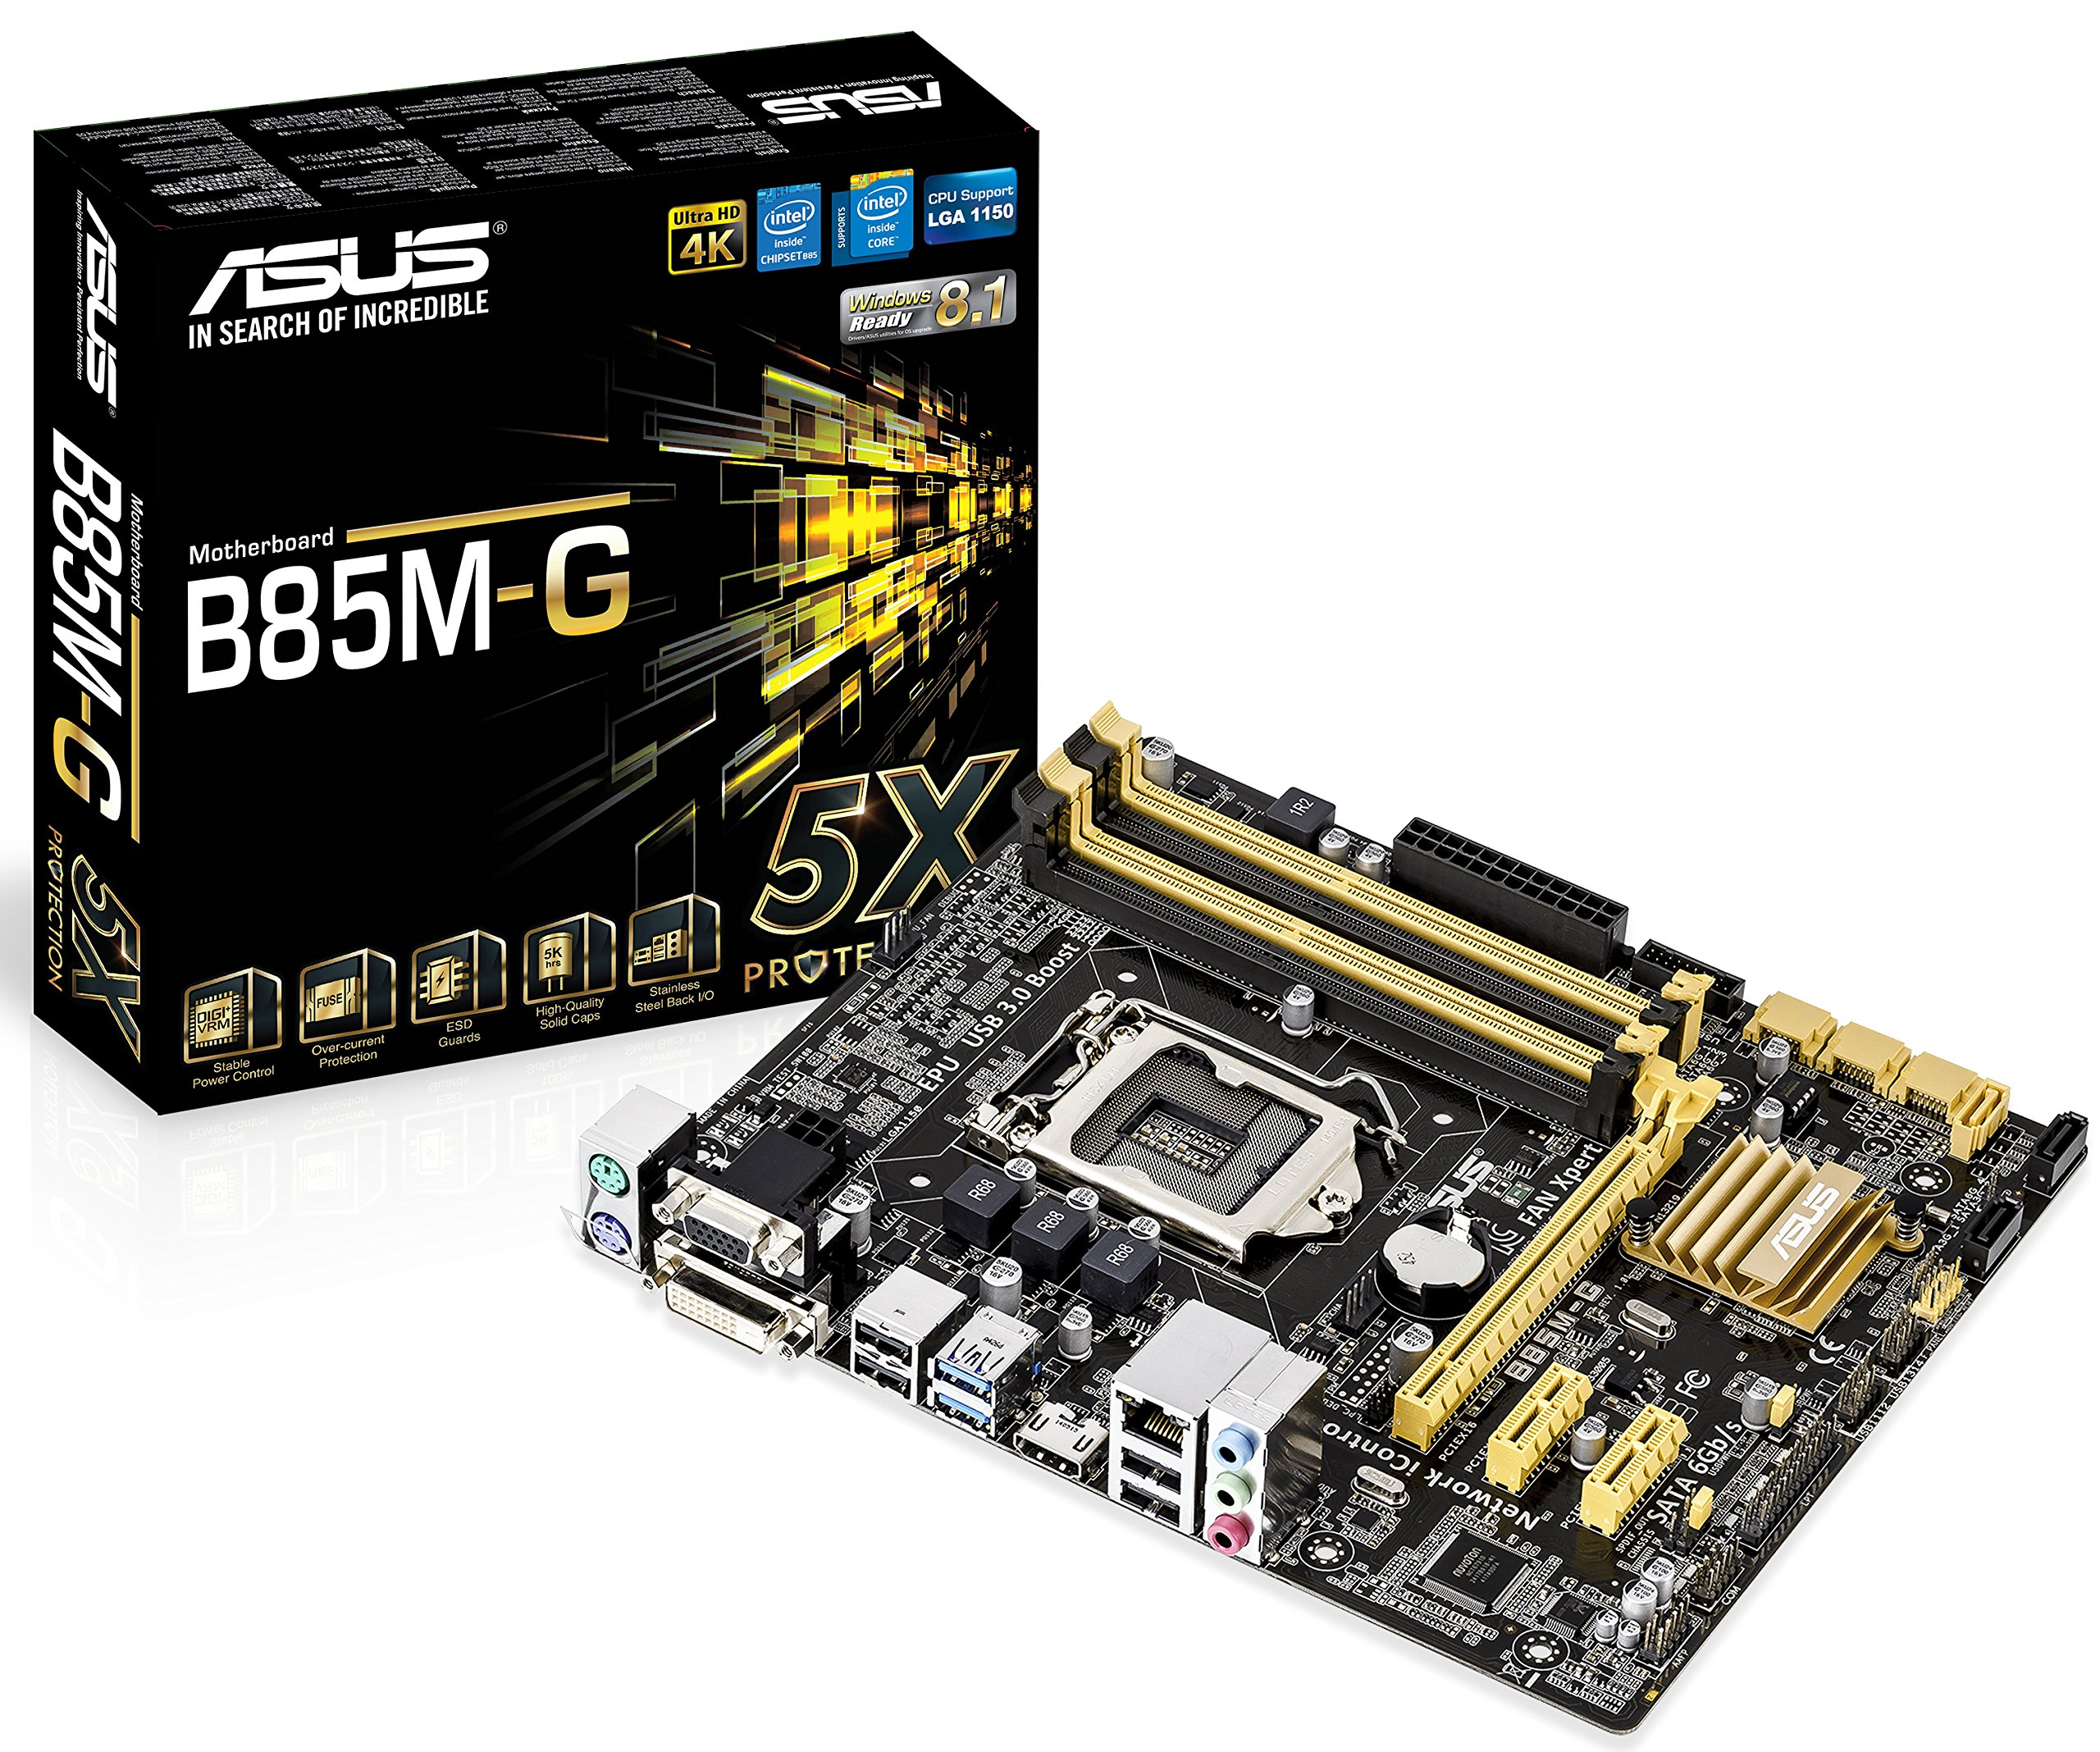 ASUS Micro ATX DDR3 1600 LGA 1150 Motherboard B85M-G by ASUS